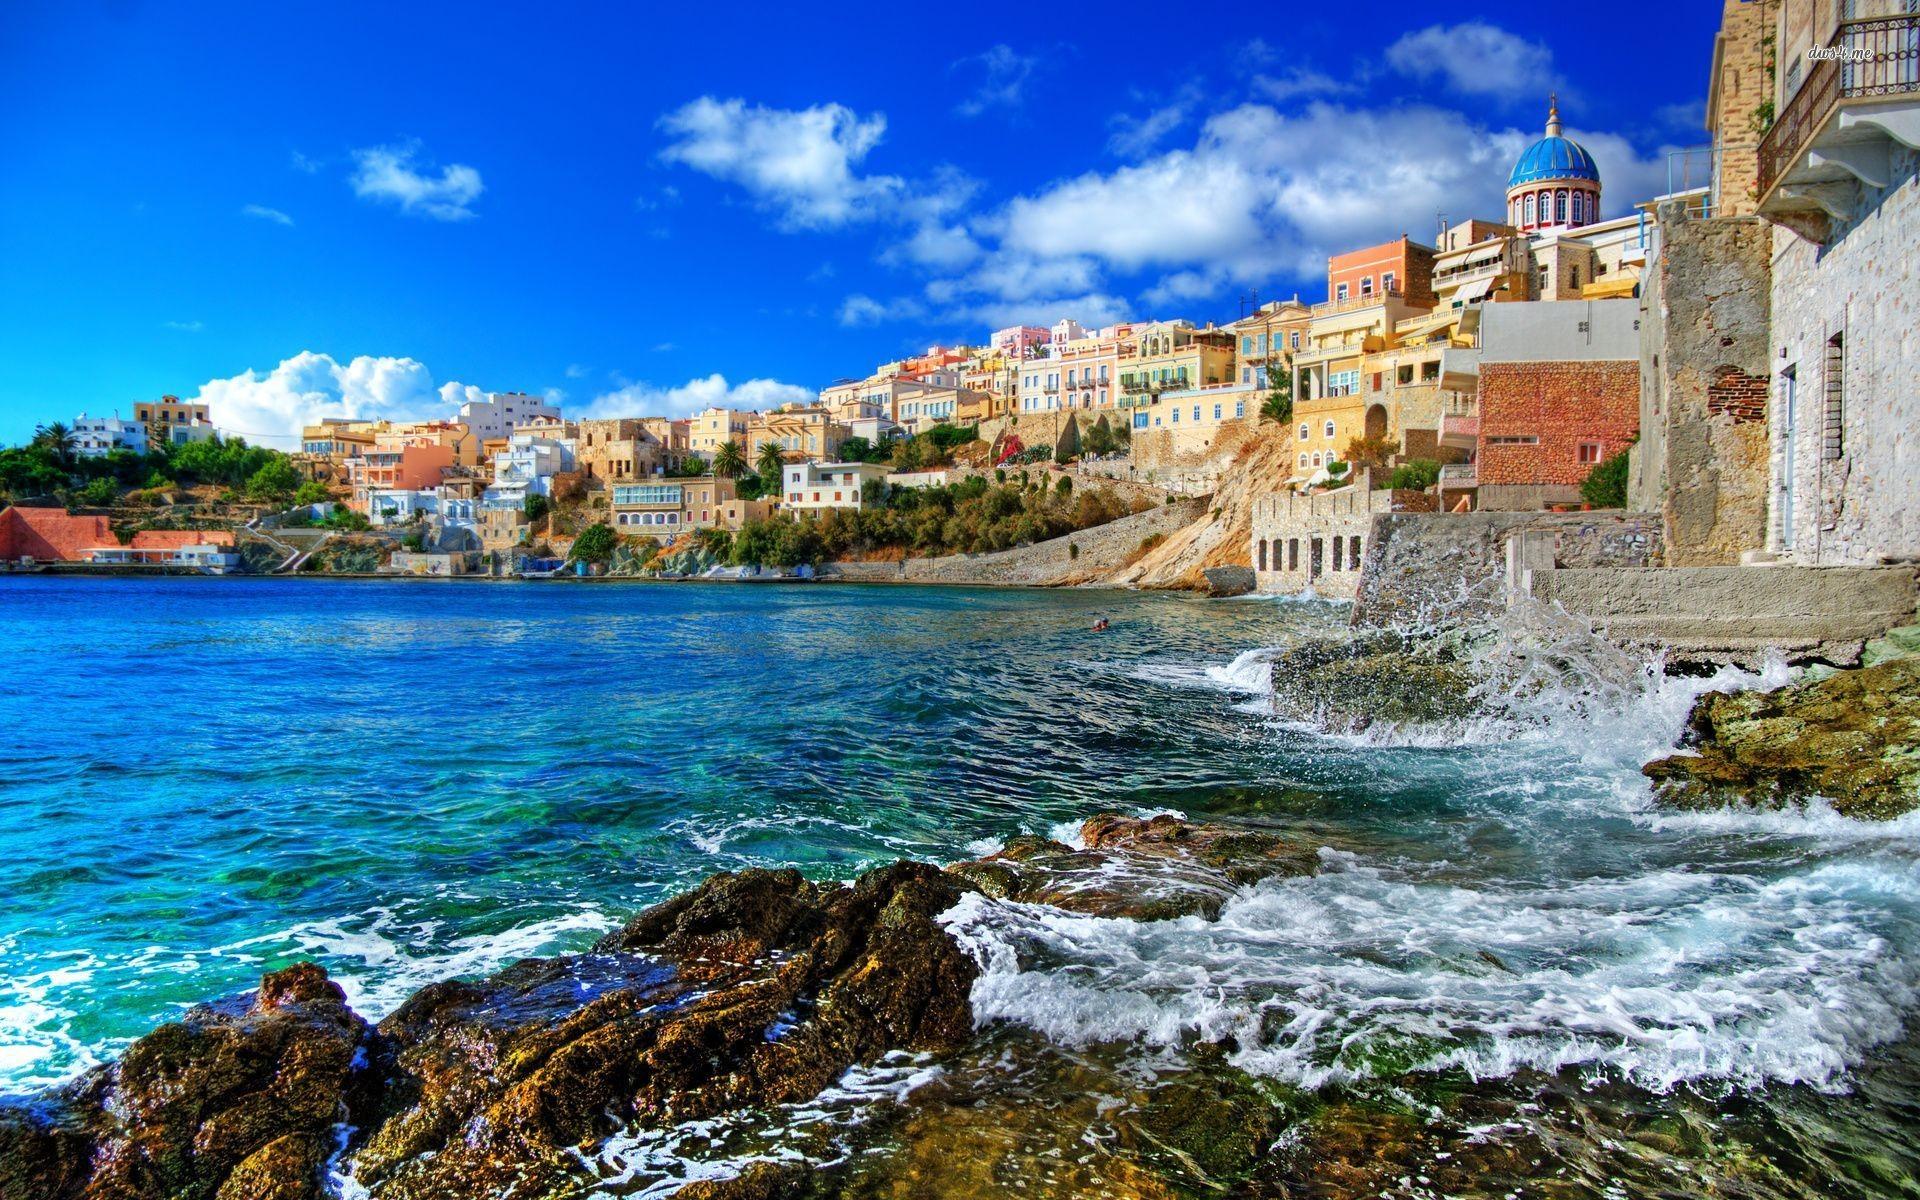 greek wallpaper 54 images